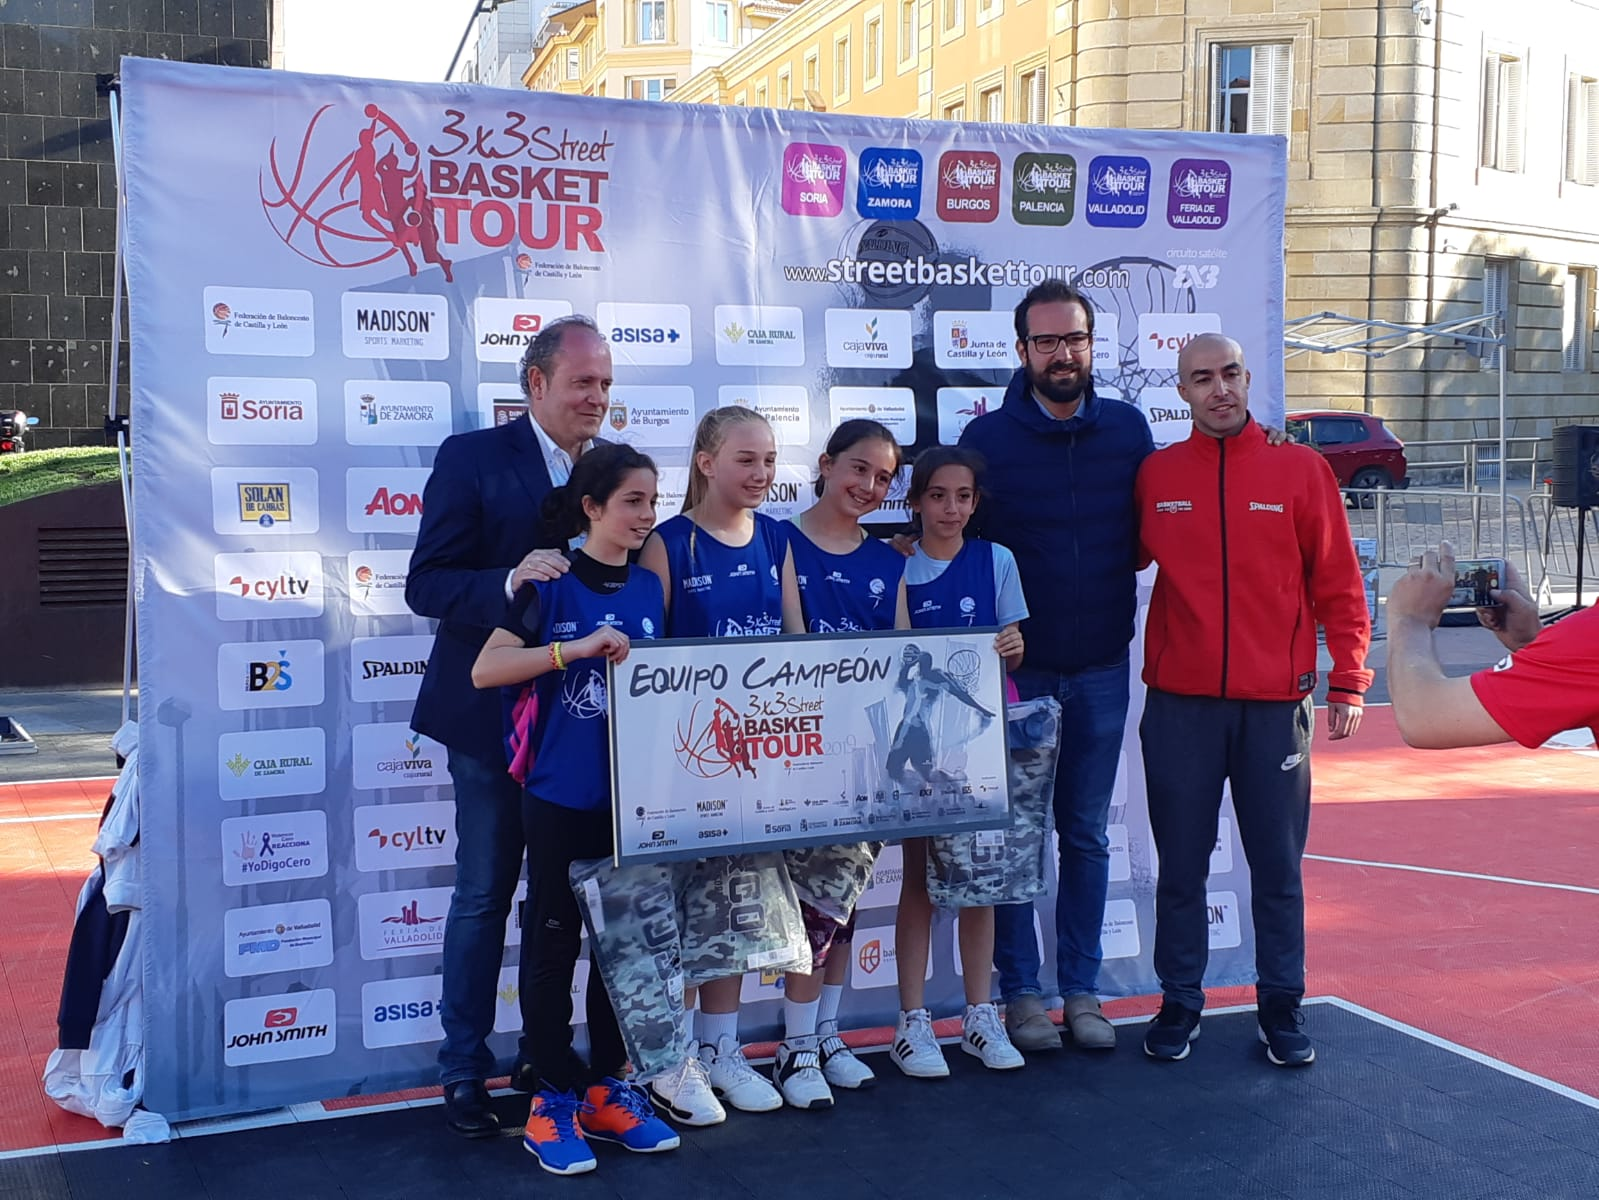 STREET BASKET TOUR SORIA 25 MAYO 2019 Campeonas Alevín Femenino - Cadete Masculino RECTA FINAL EN VALLADOLID